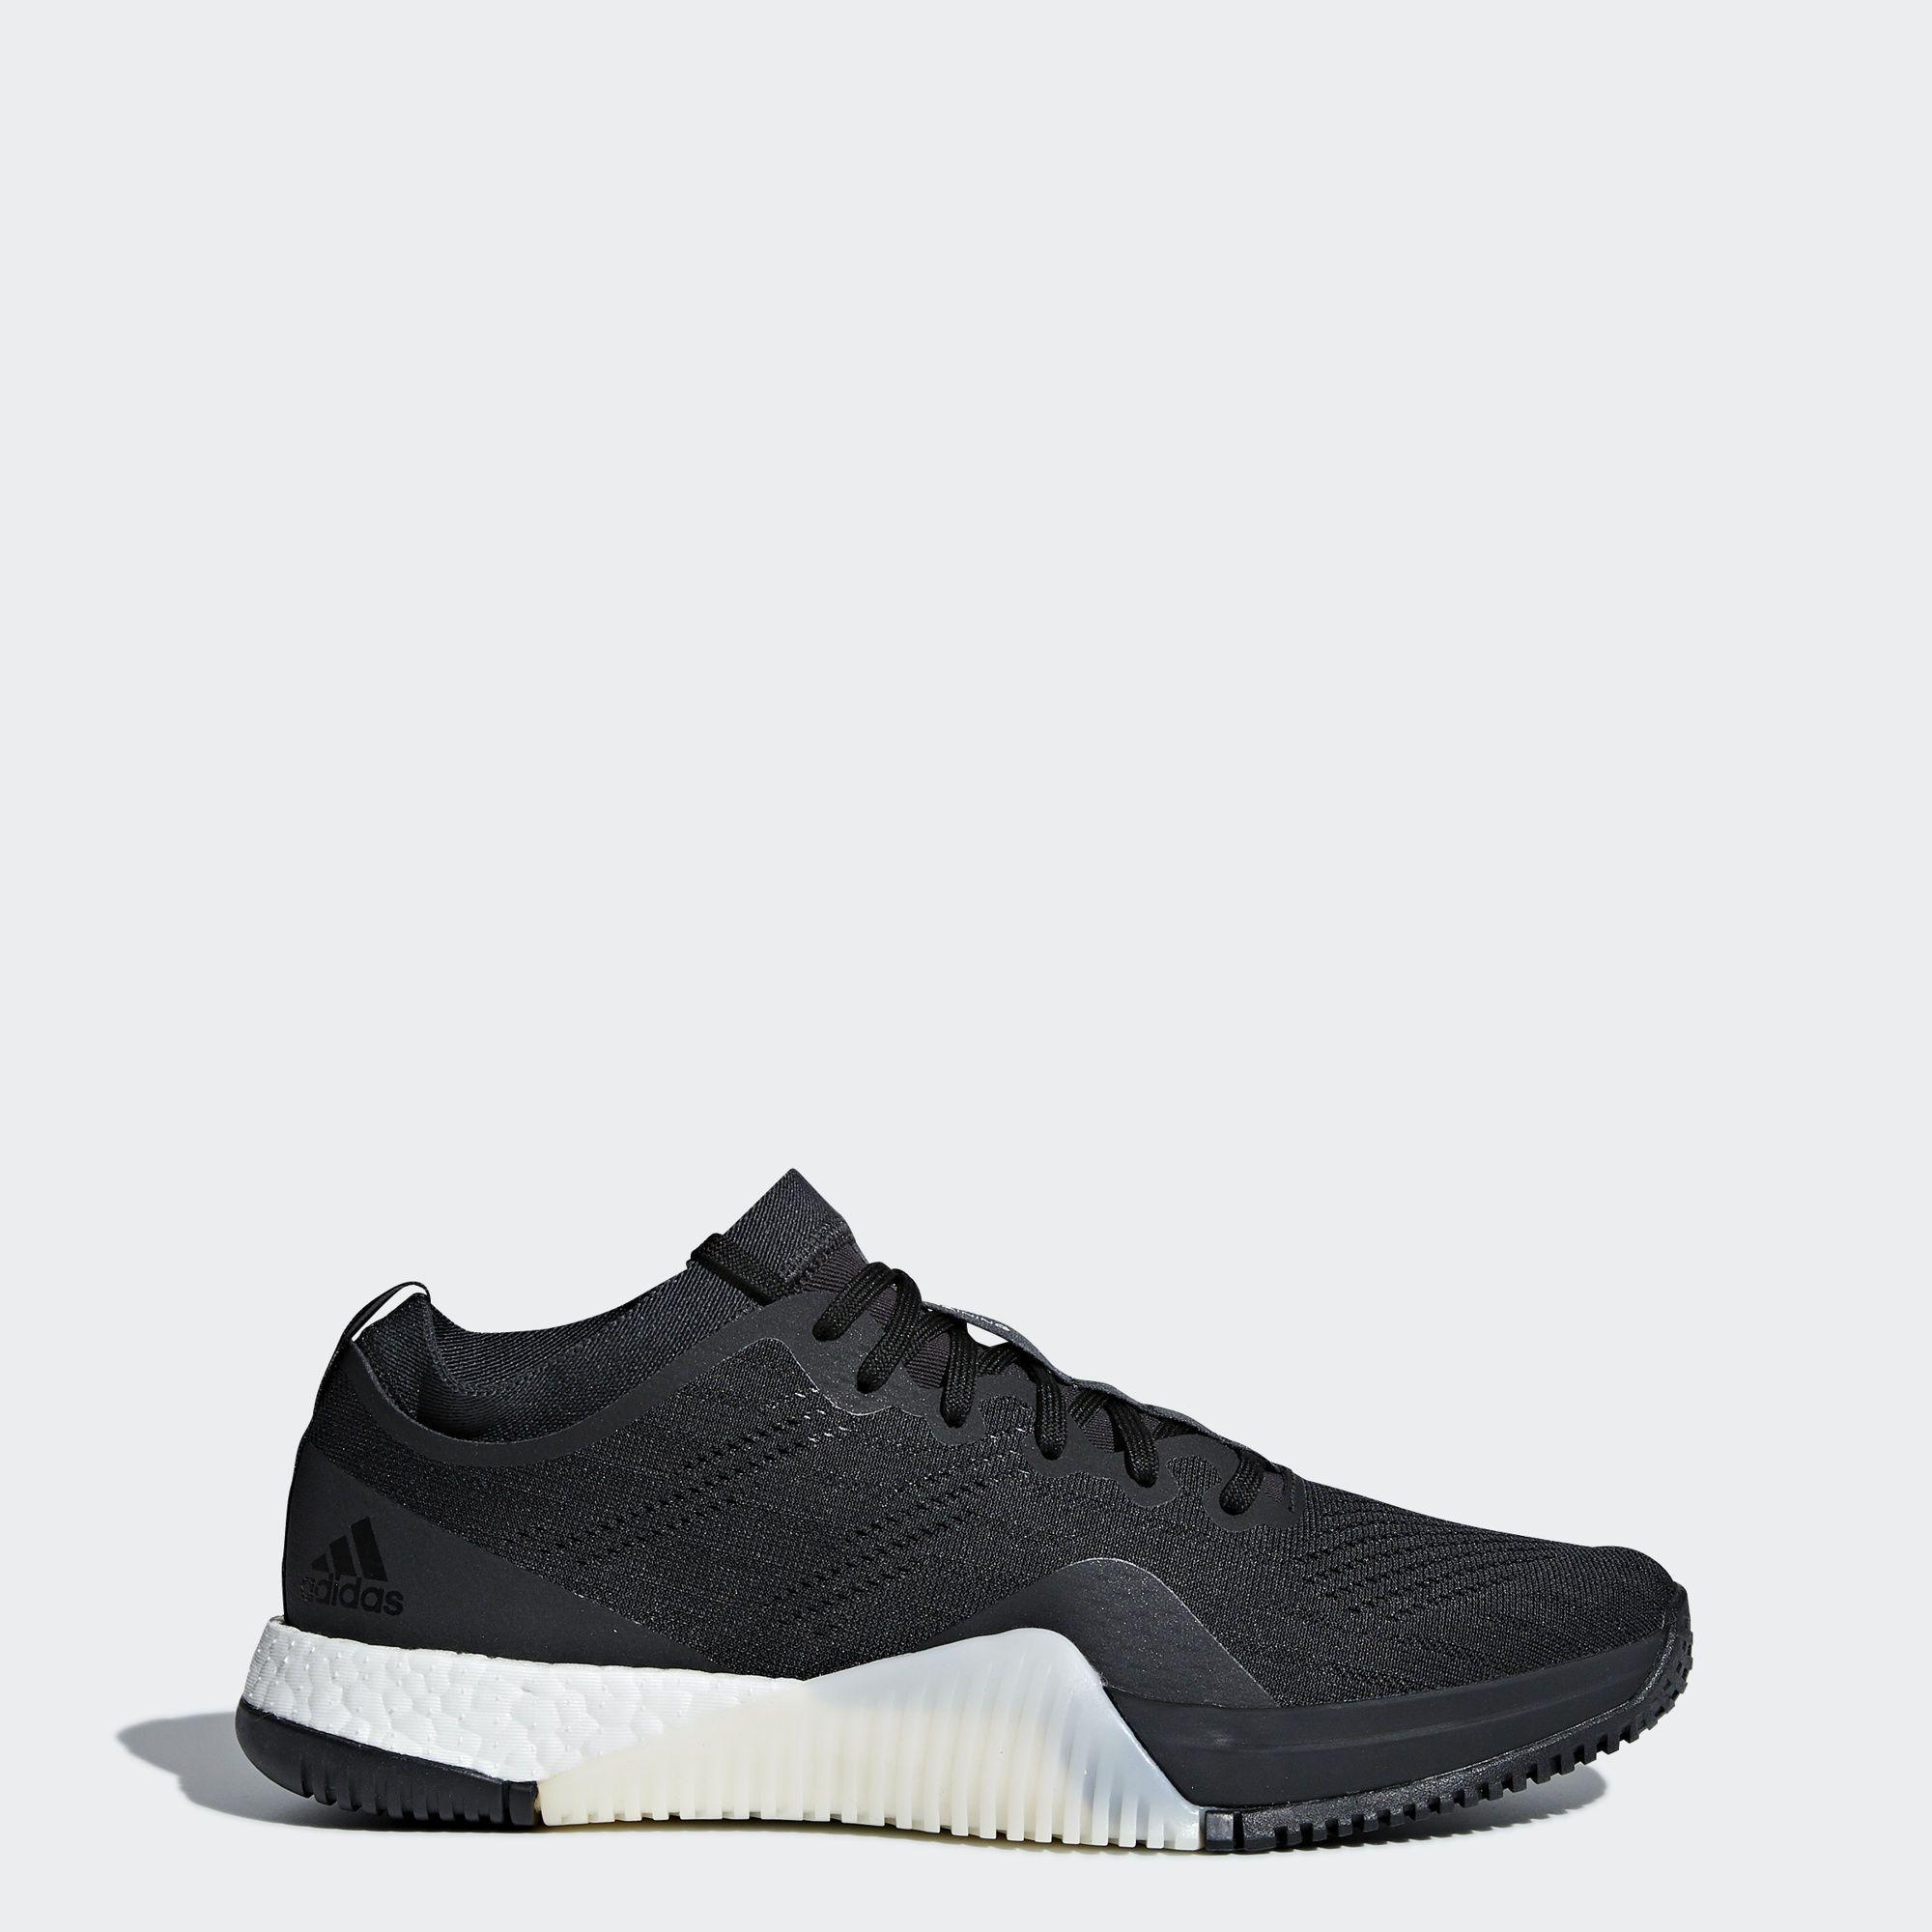 Adidas Scarpe Sportive Scarpe Crazytrain Elite Footwear